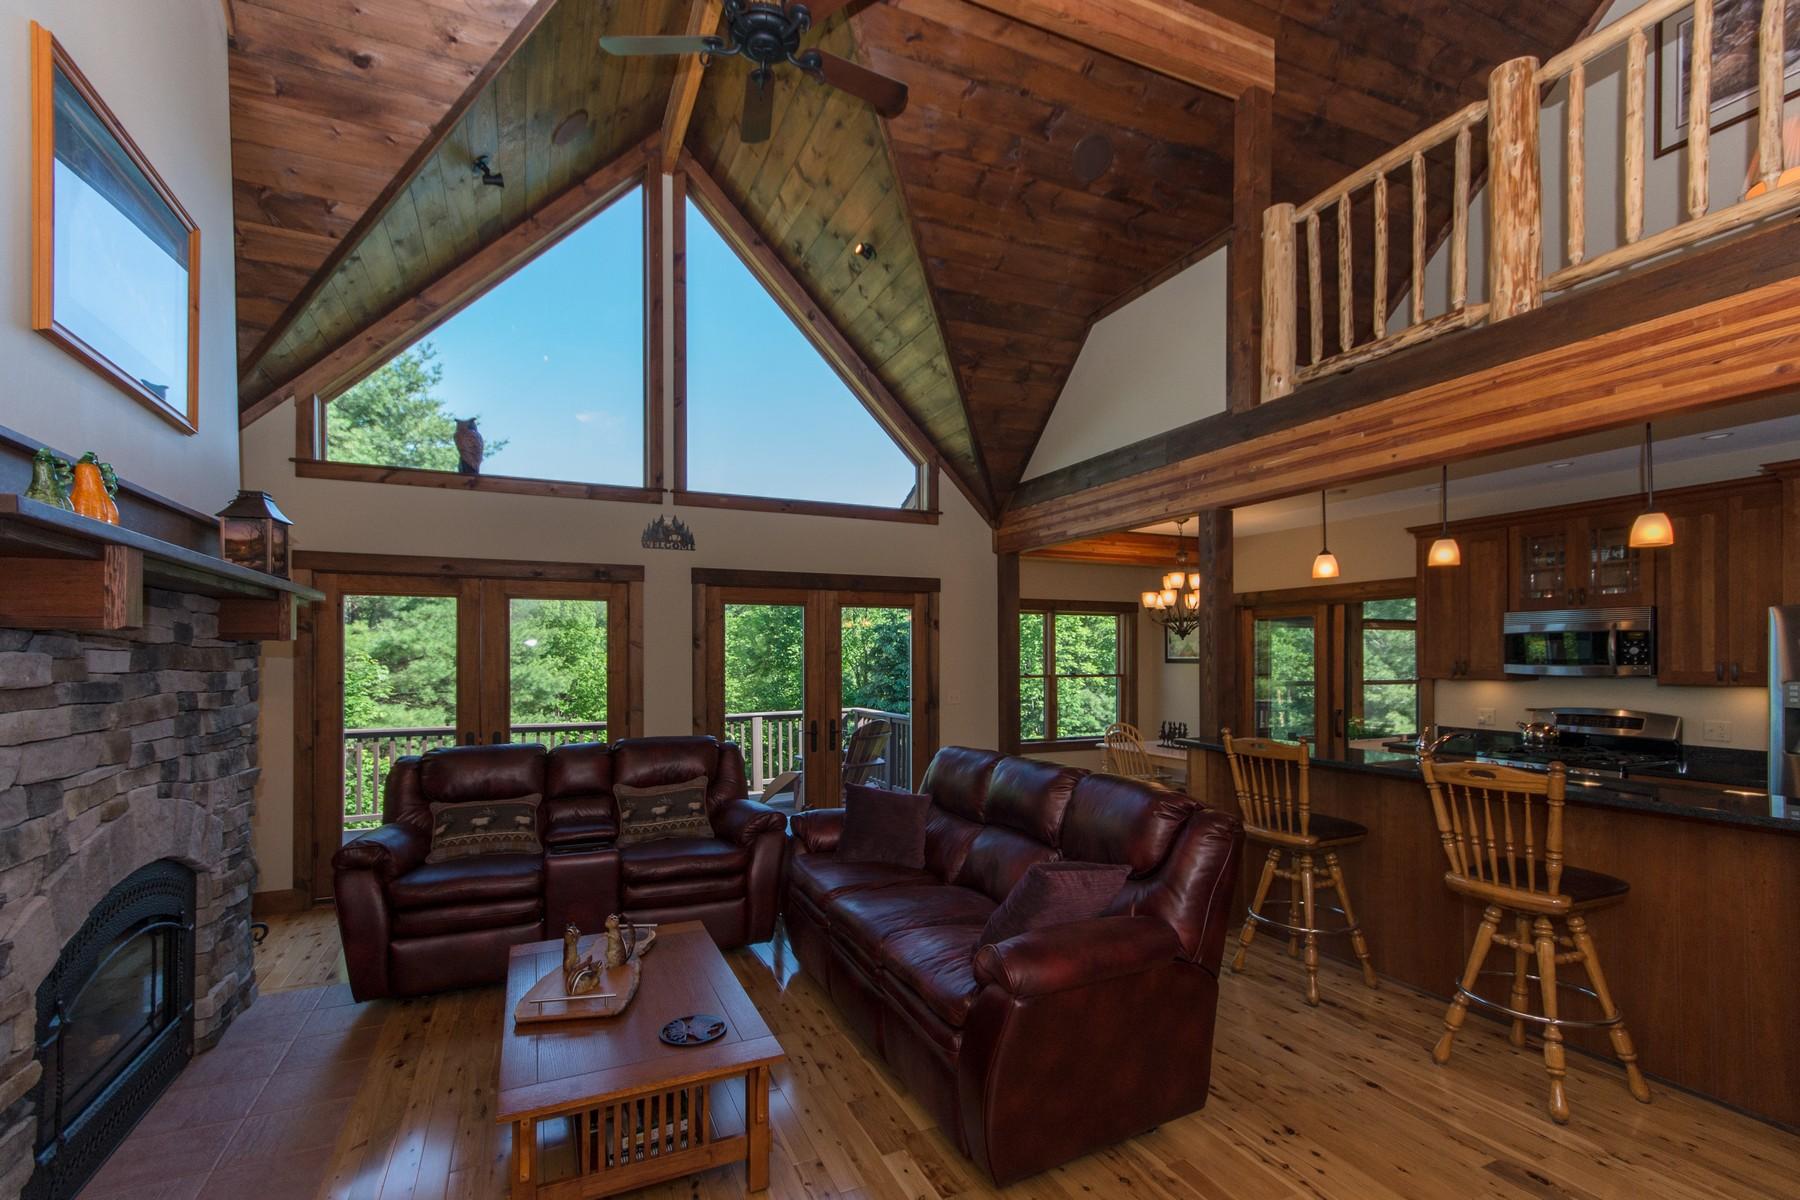 Additional photo for property listing at Exquisite Country Home 498  Stickney Bridge Rd Jay, Нью-Йорк 12941 Соединенные Штаты